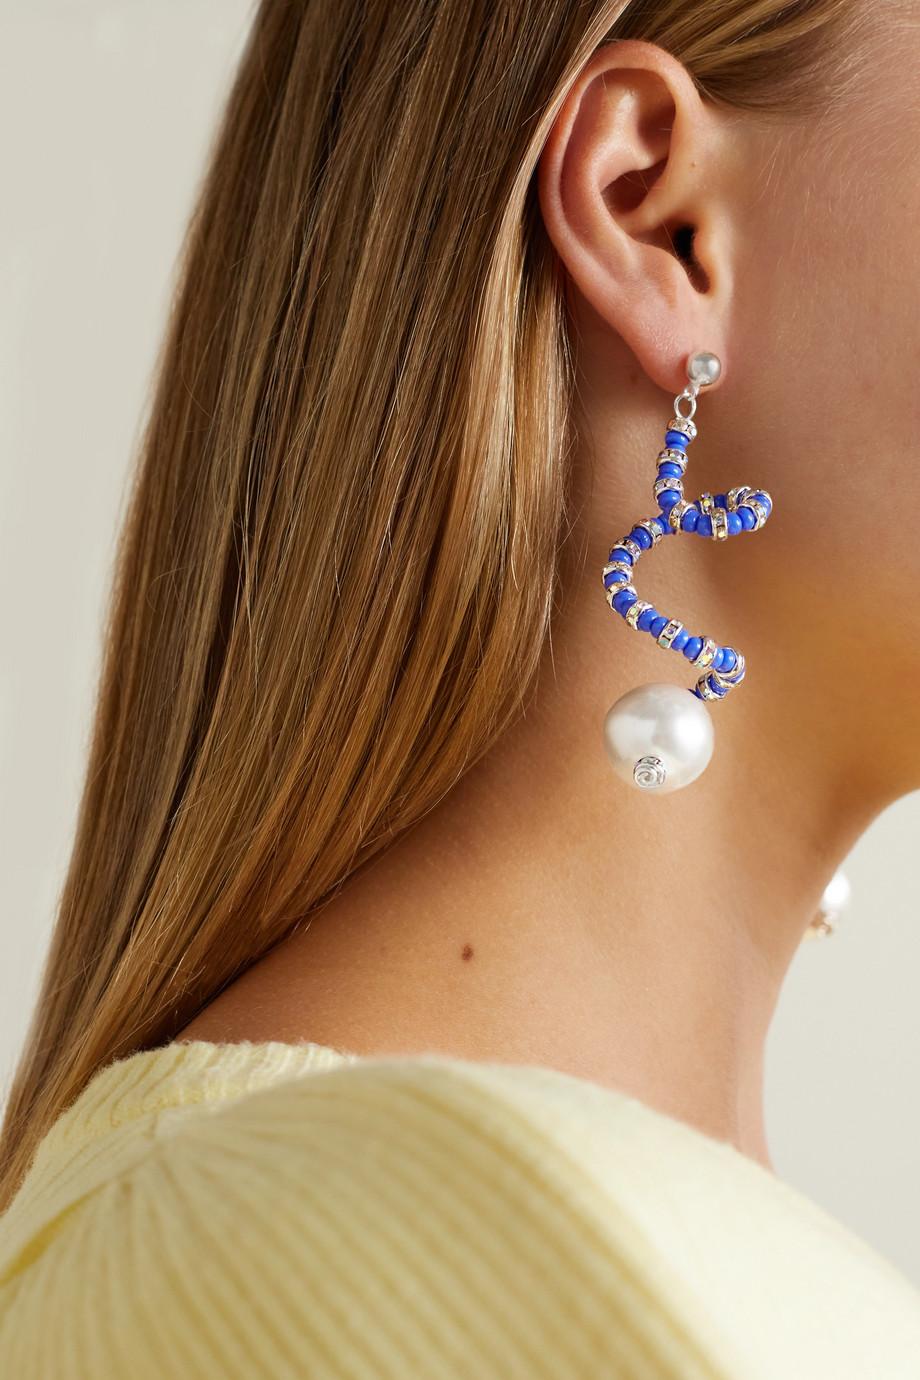 PEARL OCTOPUSS.Y Klein silver-plated multi-stone earrings